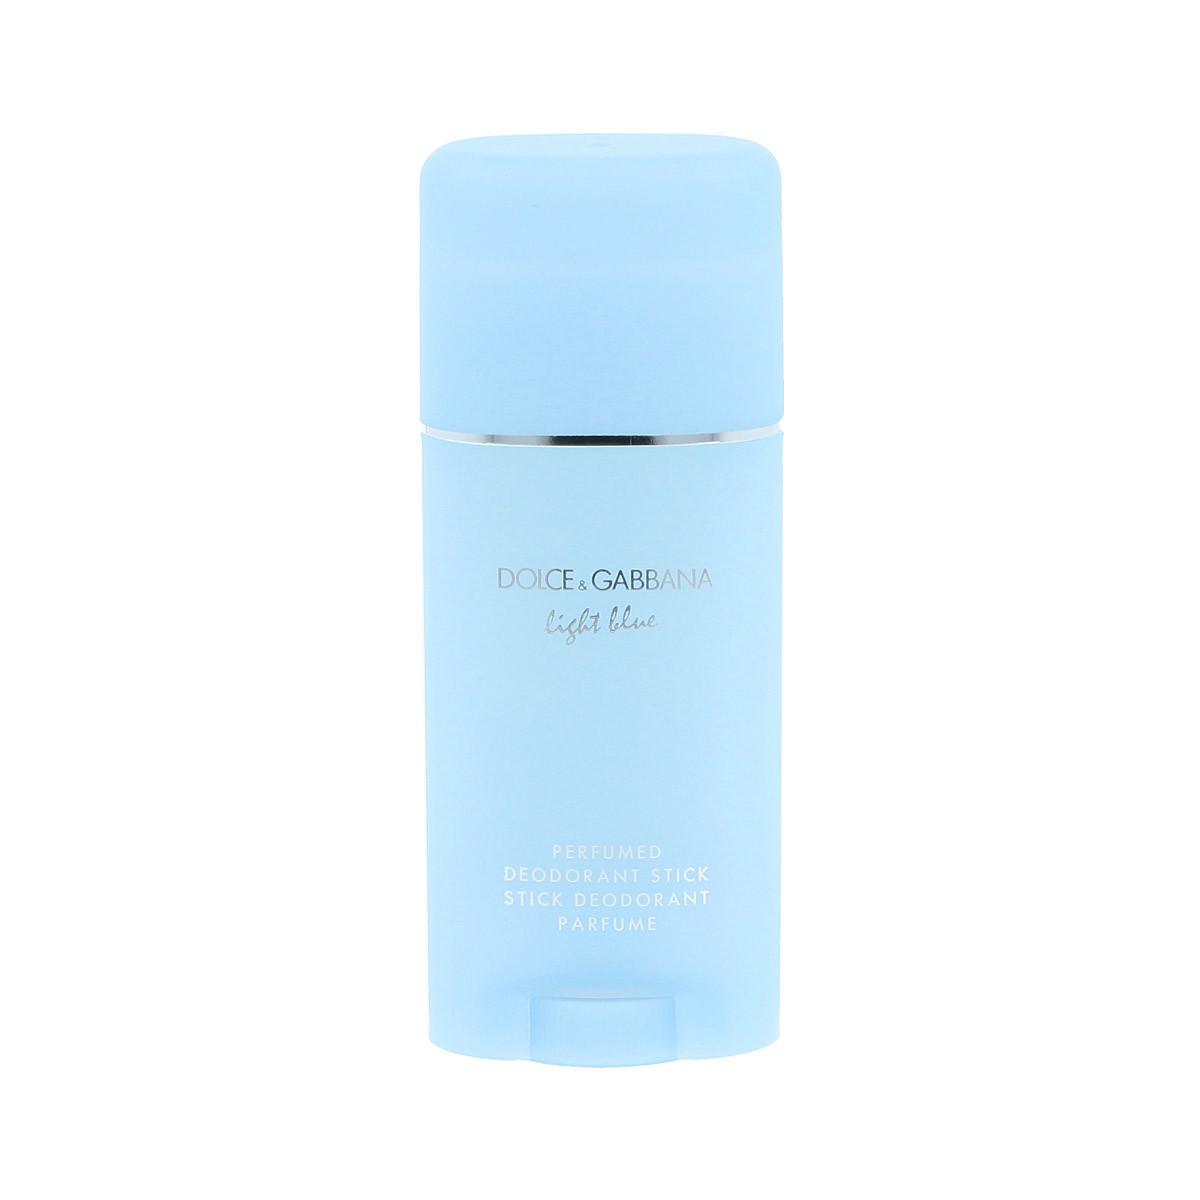 dolce gabbana light blue deostick 46 6 g woman light. Black Bedroom Furniture Sets. Home Design Ideas